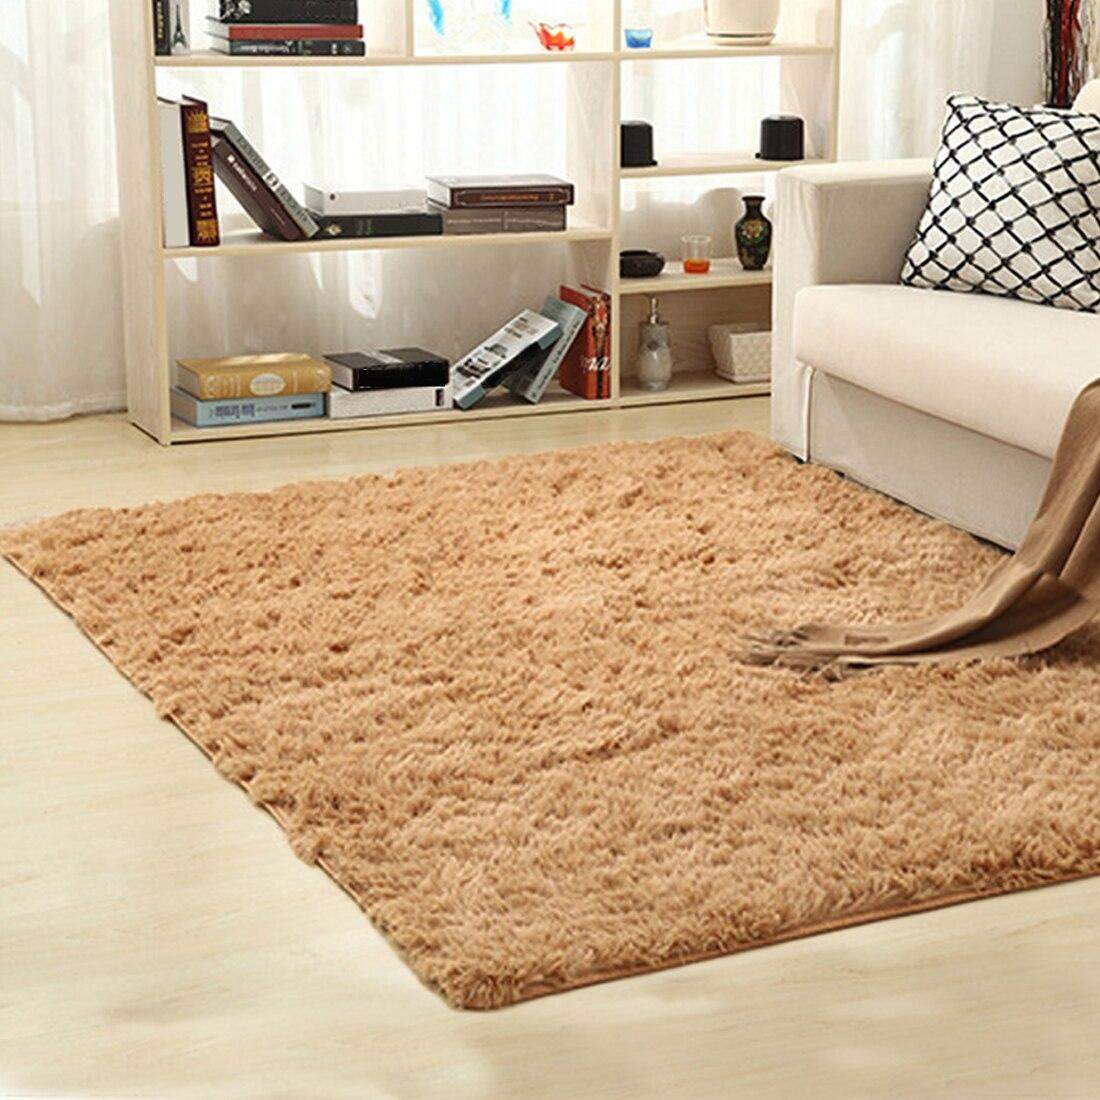 Living Room Floor Rugs - Frasesdeconquista.com